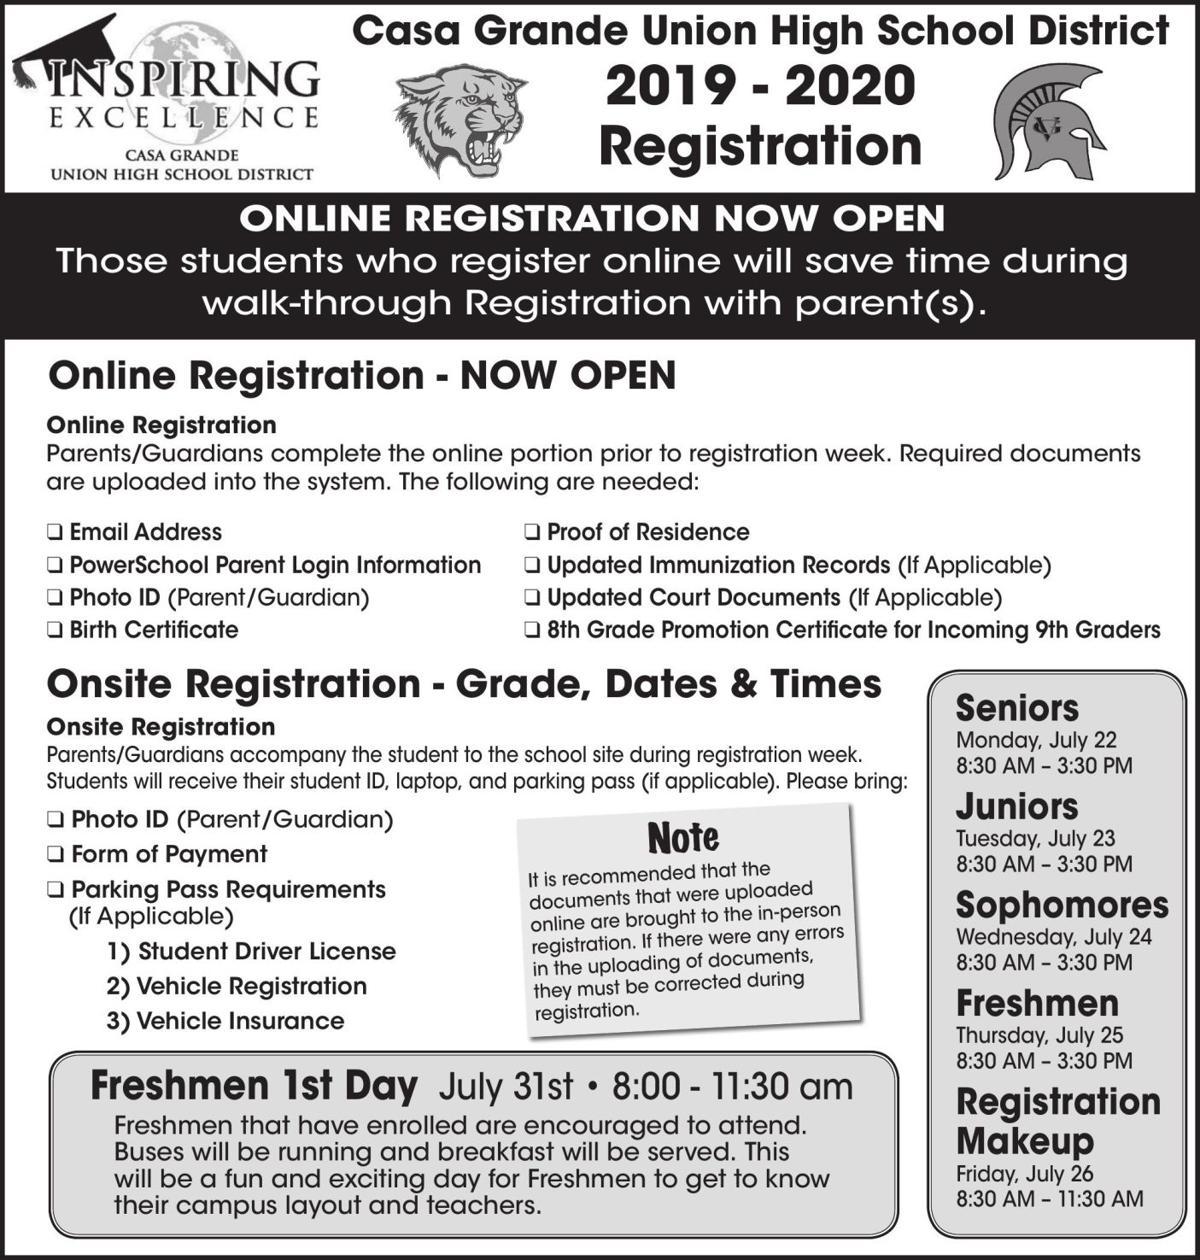 2019 - 2020 Registration - Casa Grande Union High School District